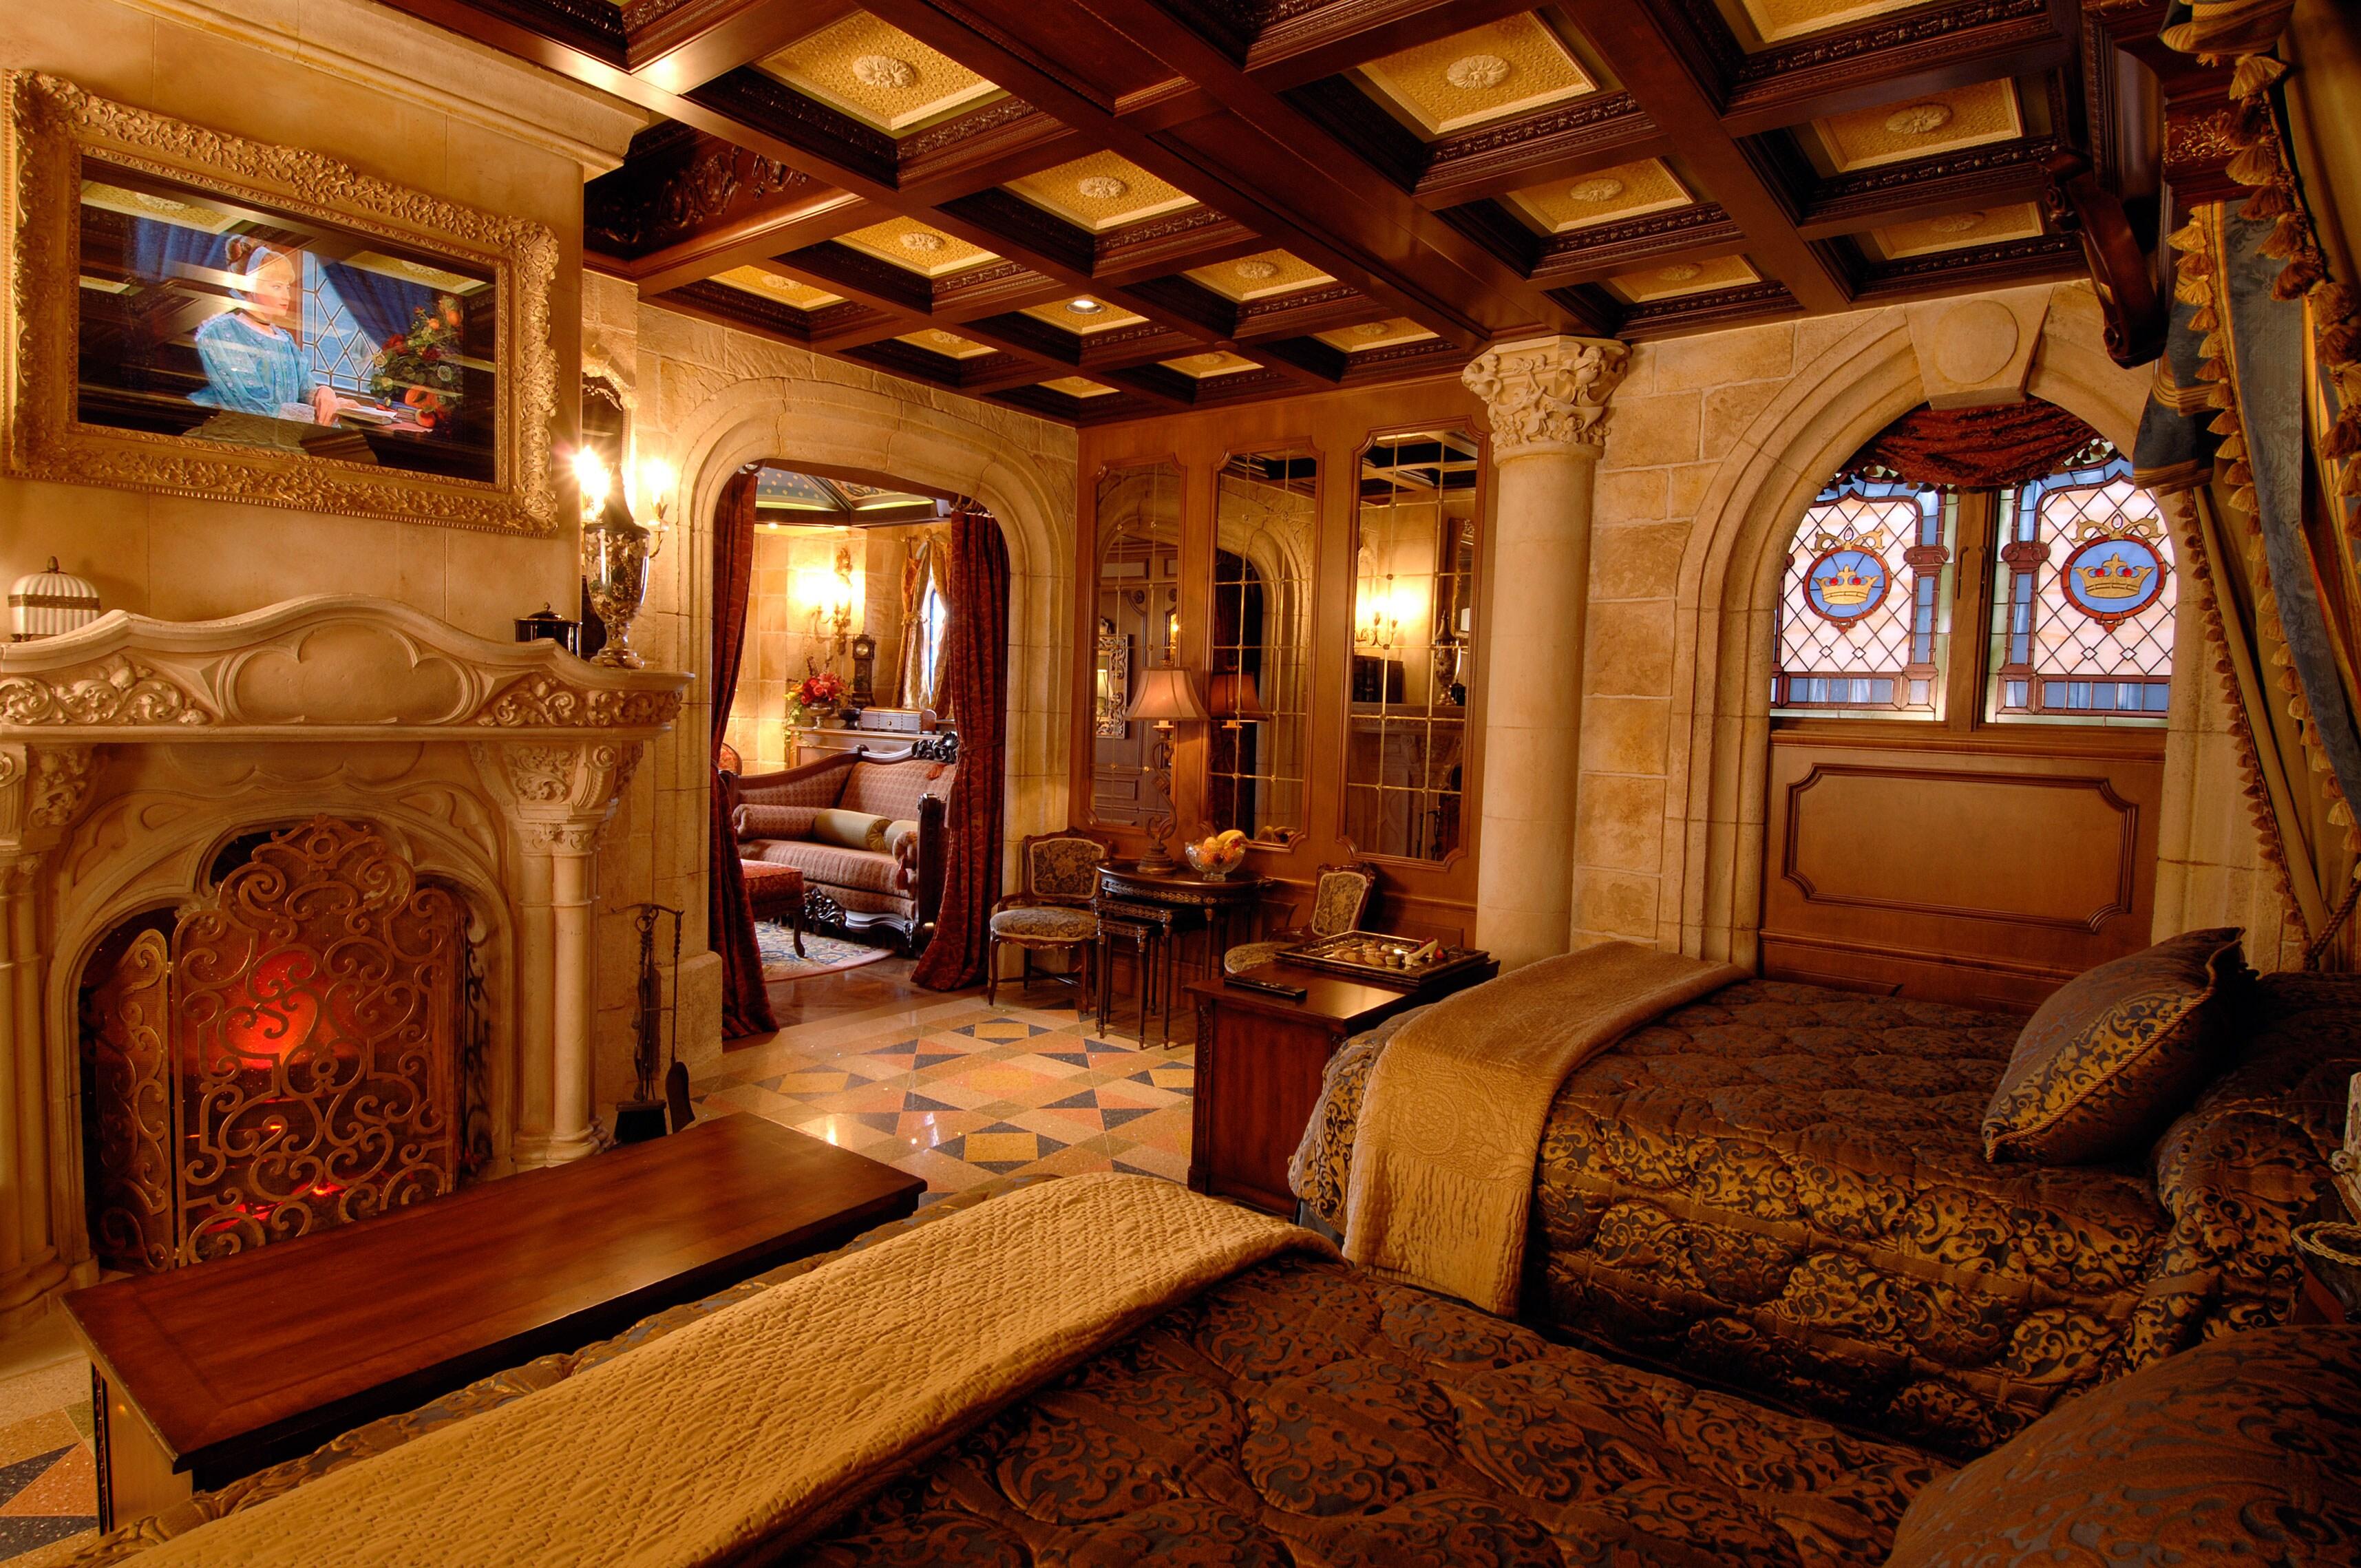 Disney mostra suíte do Castelo da Cinderela